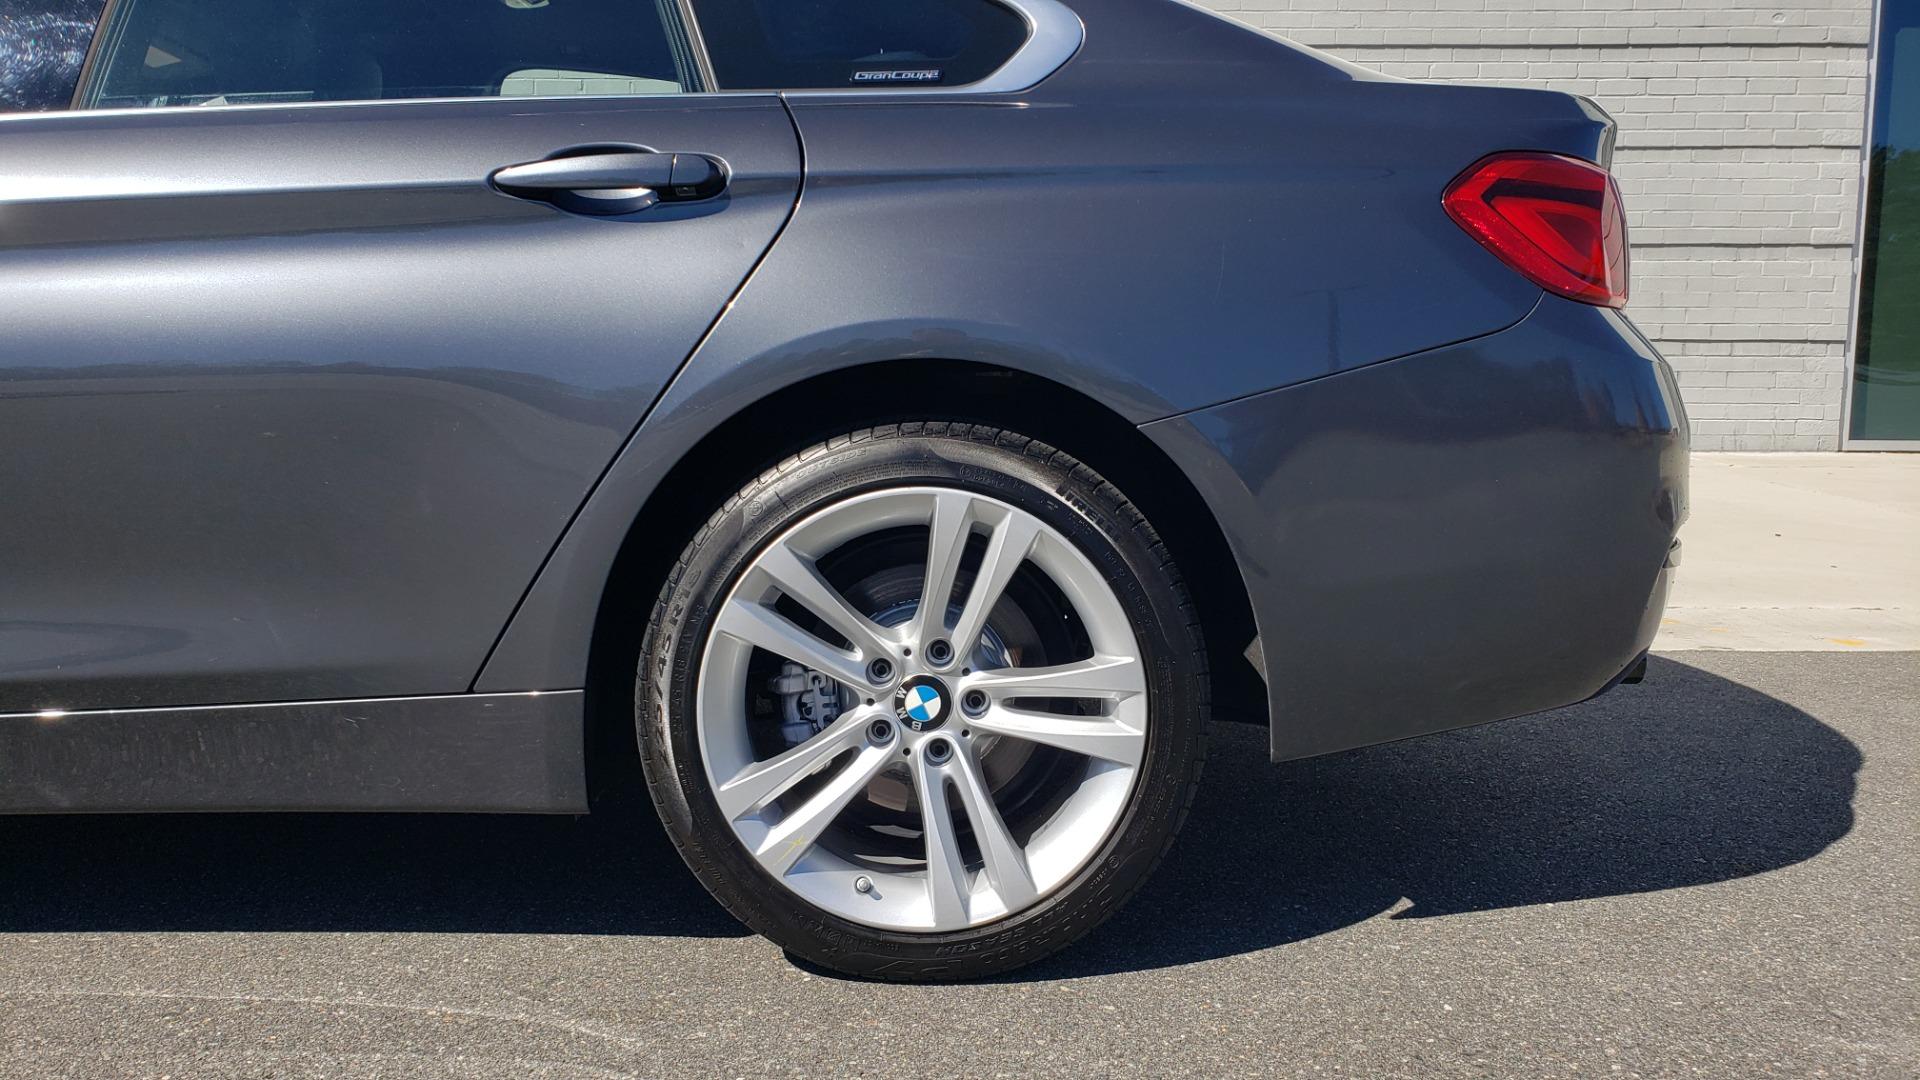 Used 2018 BMW 4 SERIES 430IXDRIVE / PREMIUM / NAV / SUNROOF / ESSENTIALS PKG for sale $29,495 at Formula Imports in Charlotte NC 28227 79